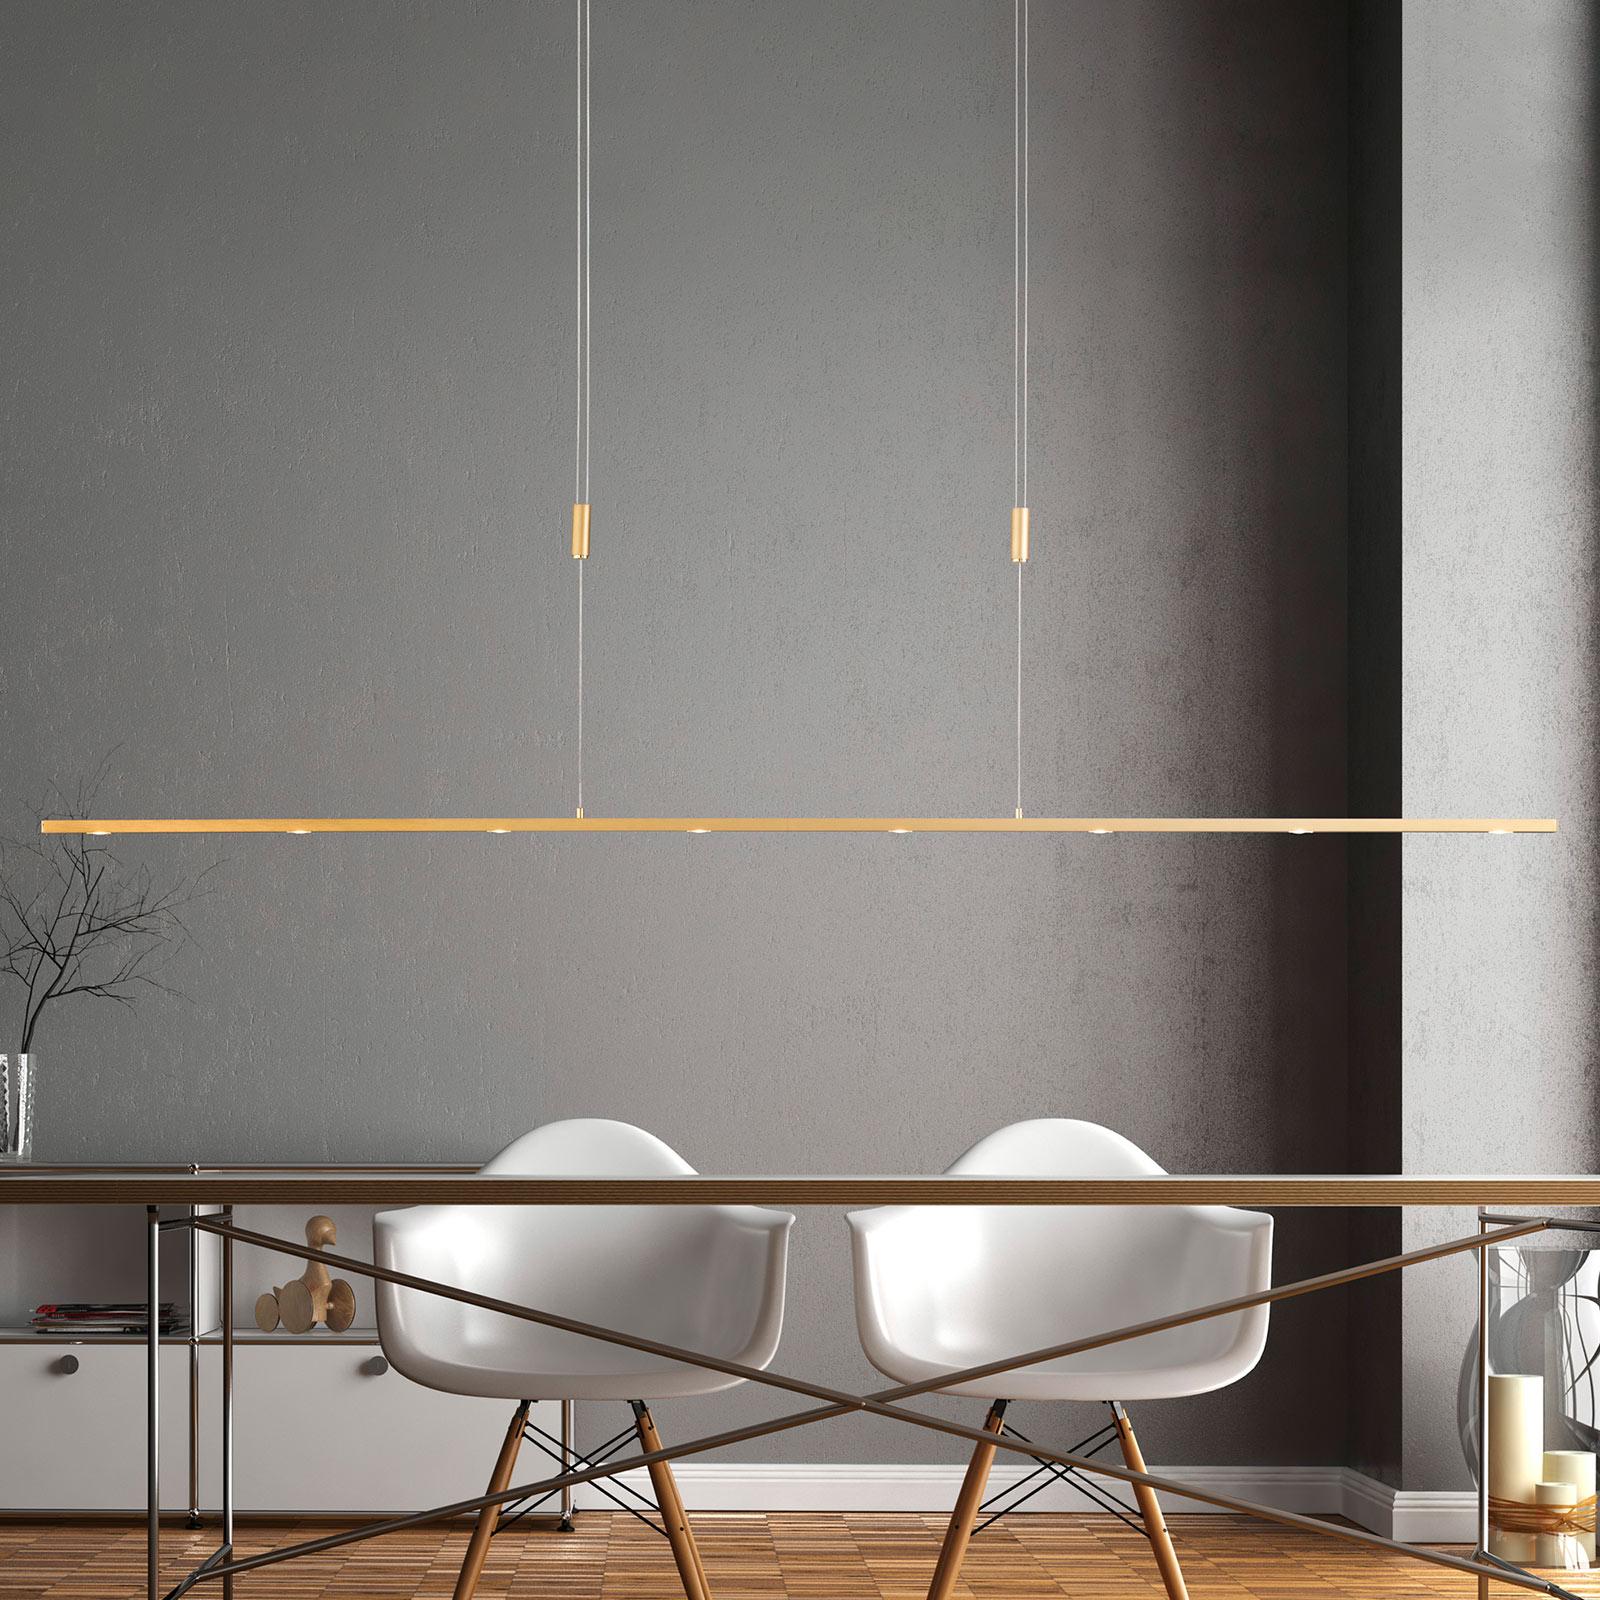 Lucande Tolu sospensione, ottone, 179 cm